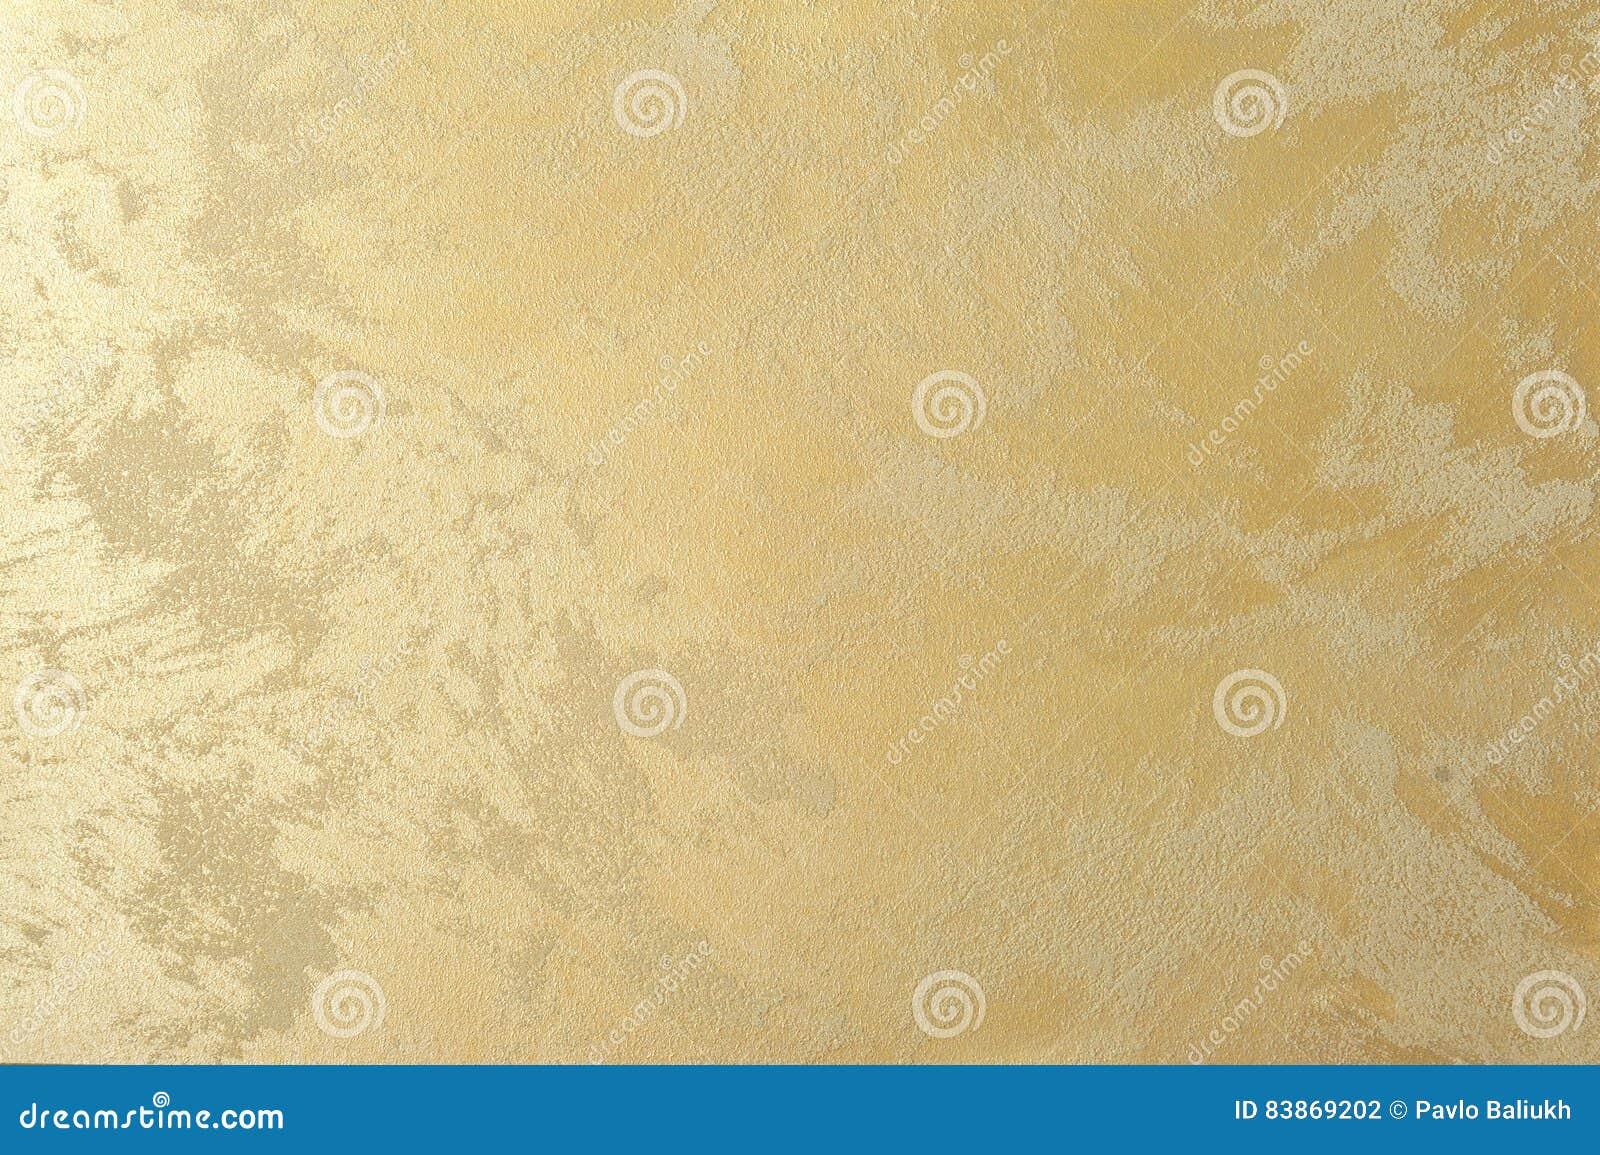 Pearl Golden Effect Decorative Plaster Art Background Stock Photo ...